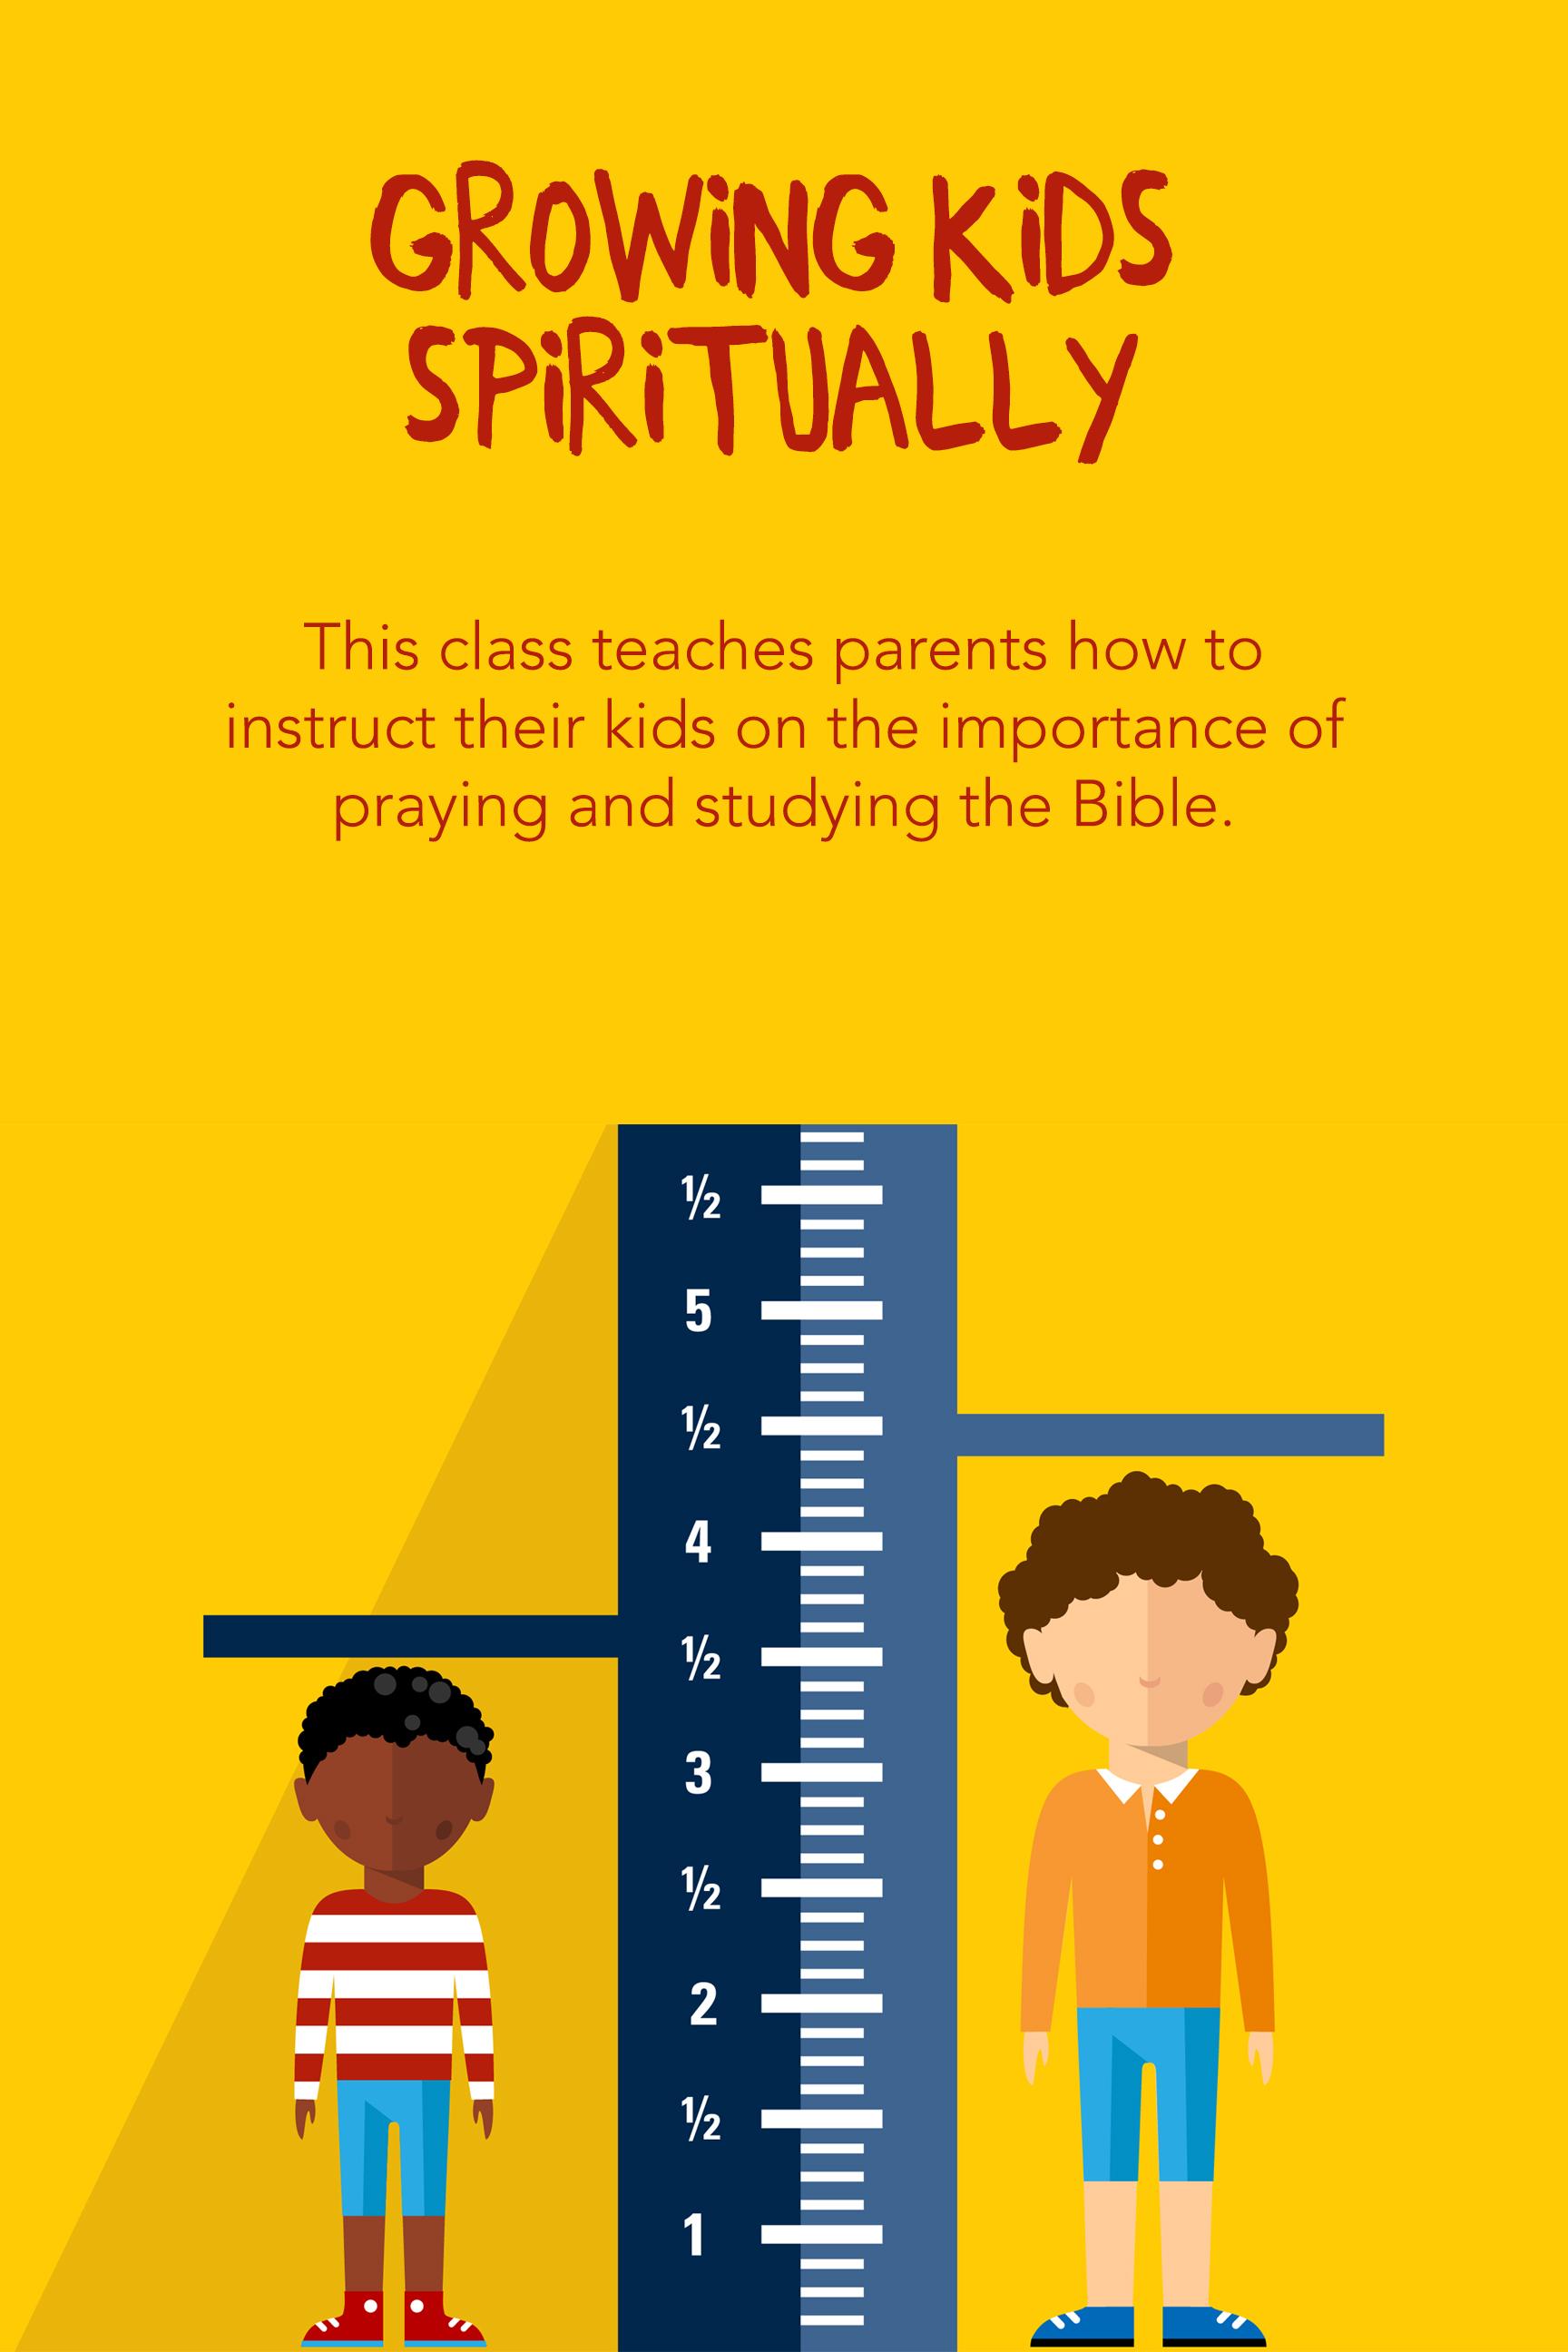 Growing kids spiritually